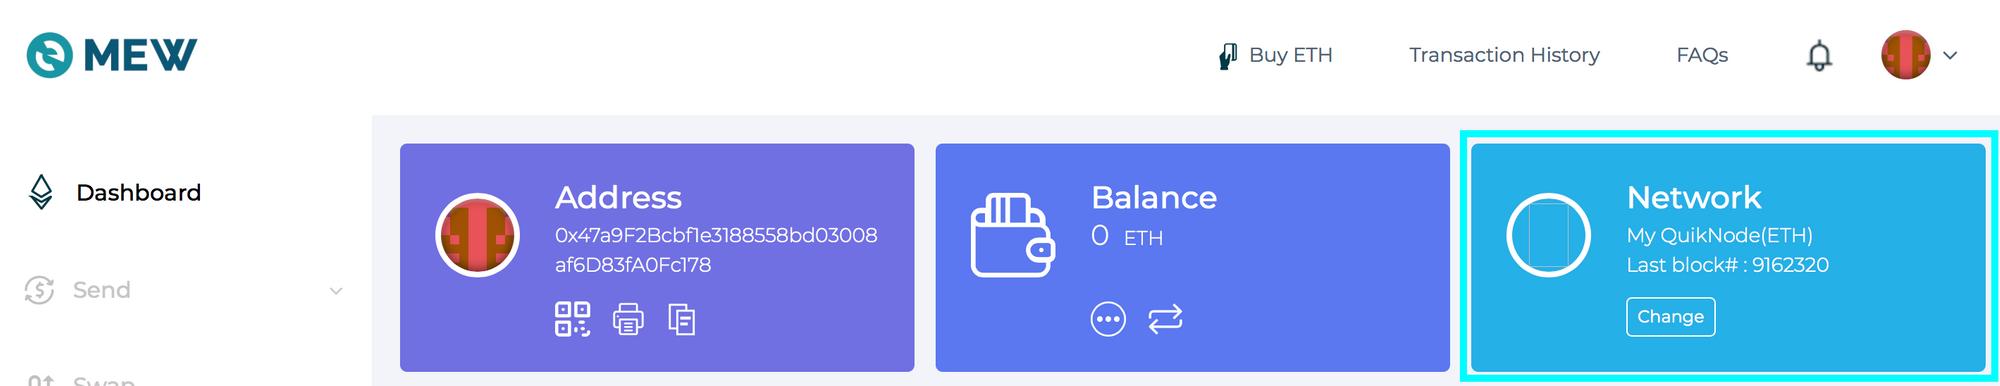 QuikNode%20Wallets/Screenshot_2019-12-25_15.04.20.png